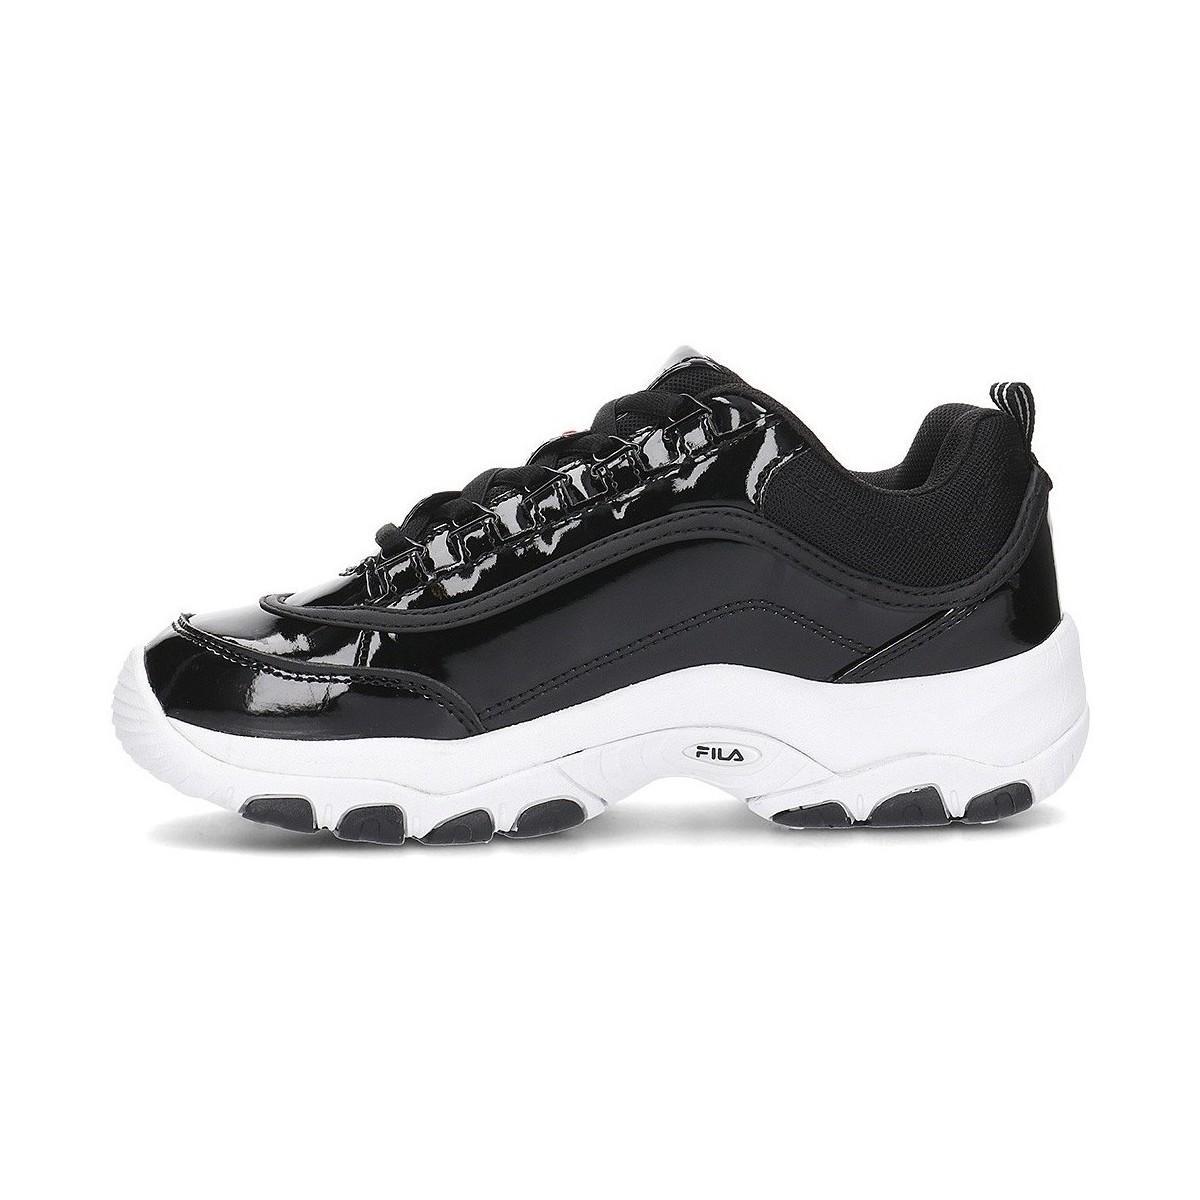 Strada Low Chaussures Fila en coloris Noir